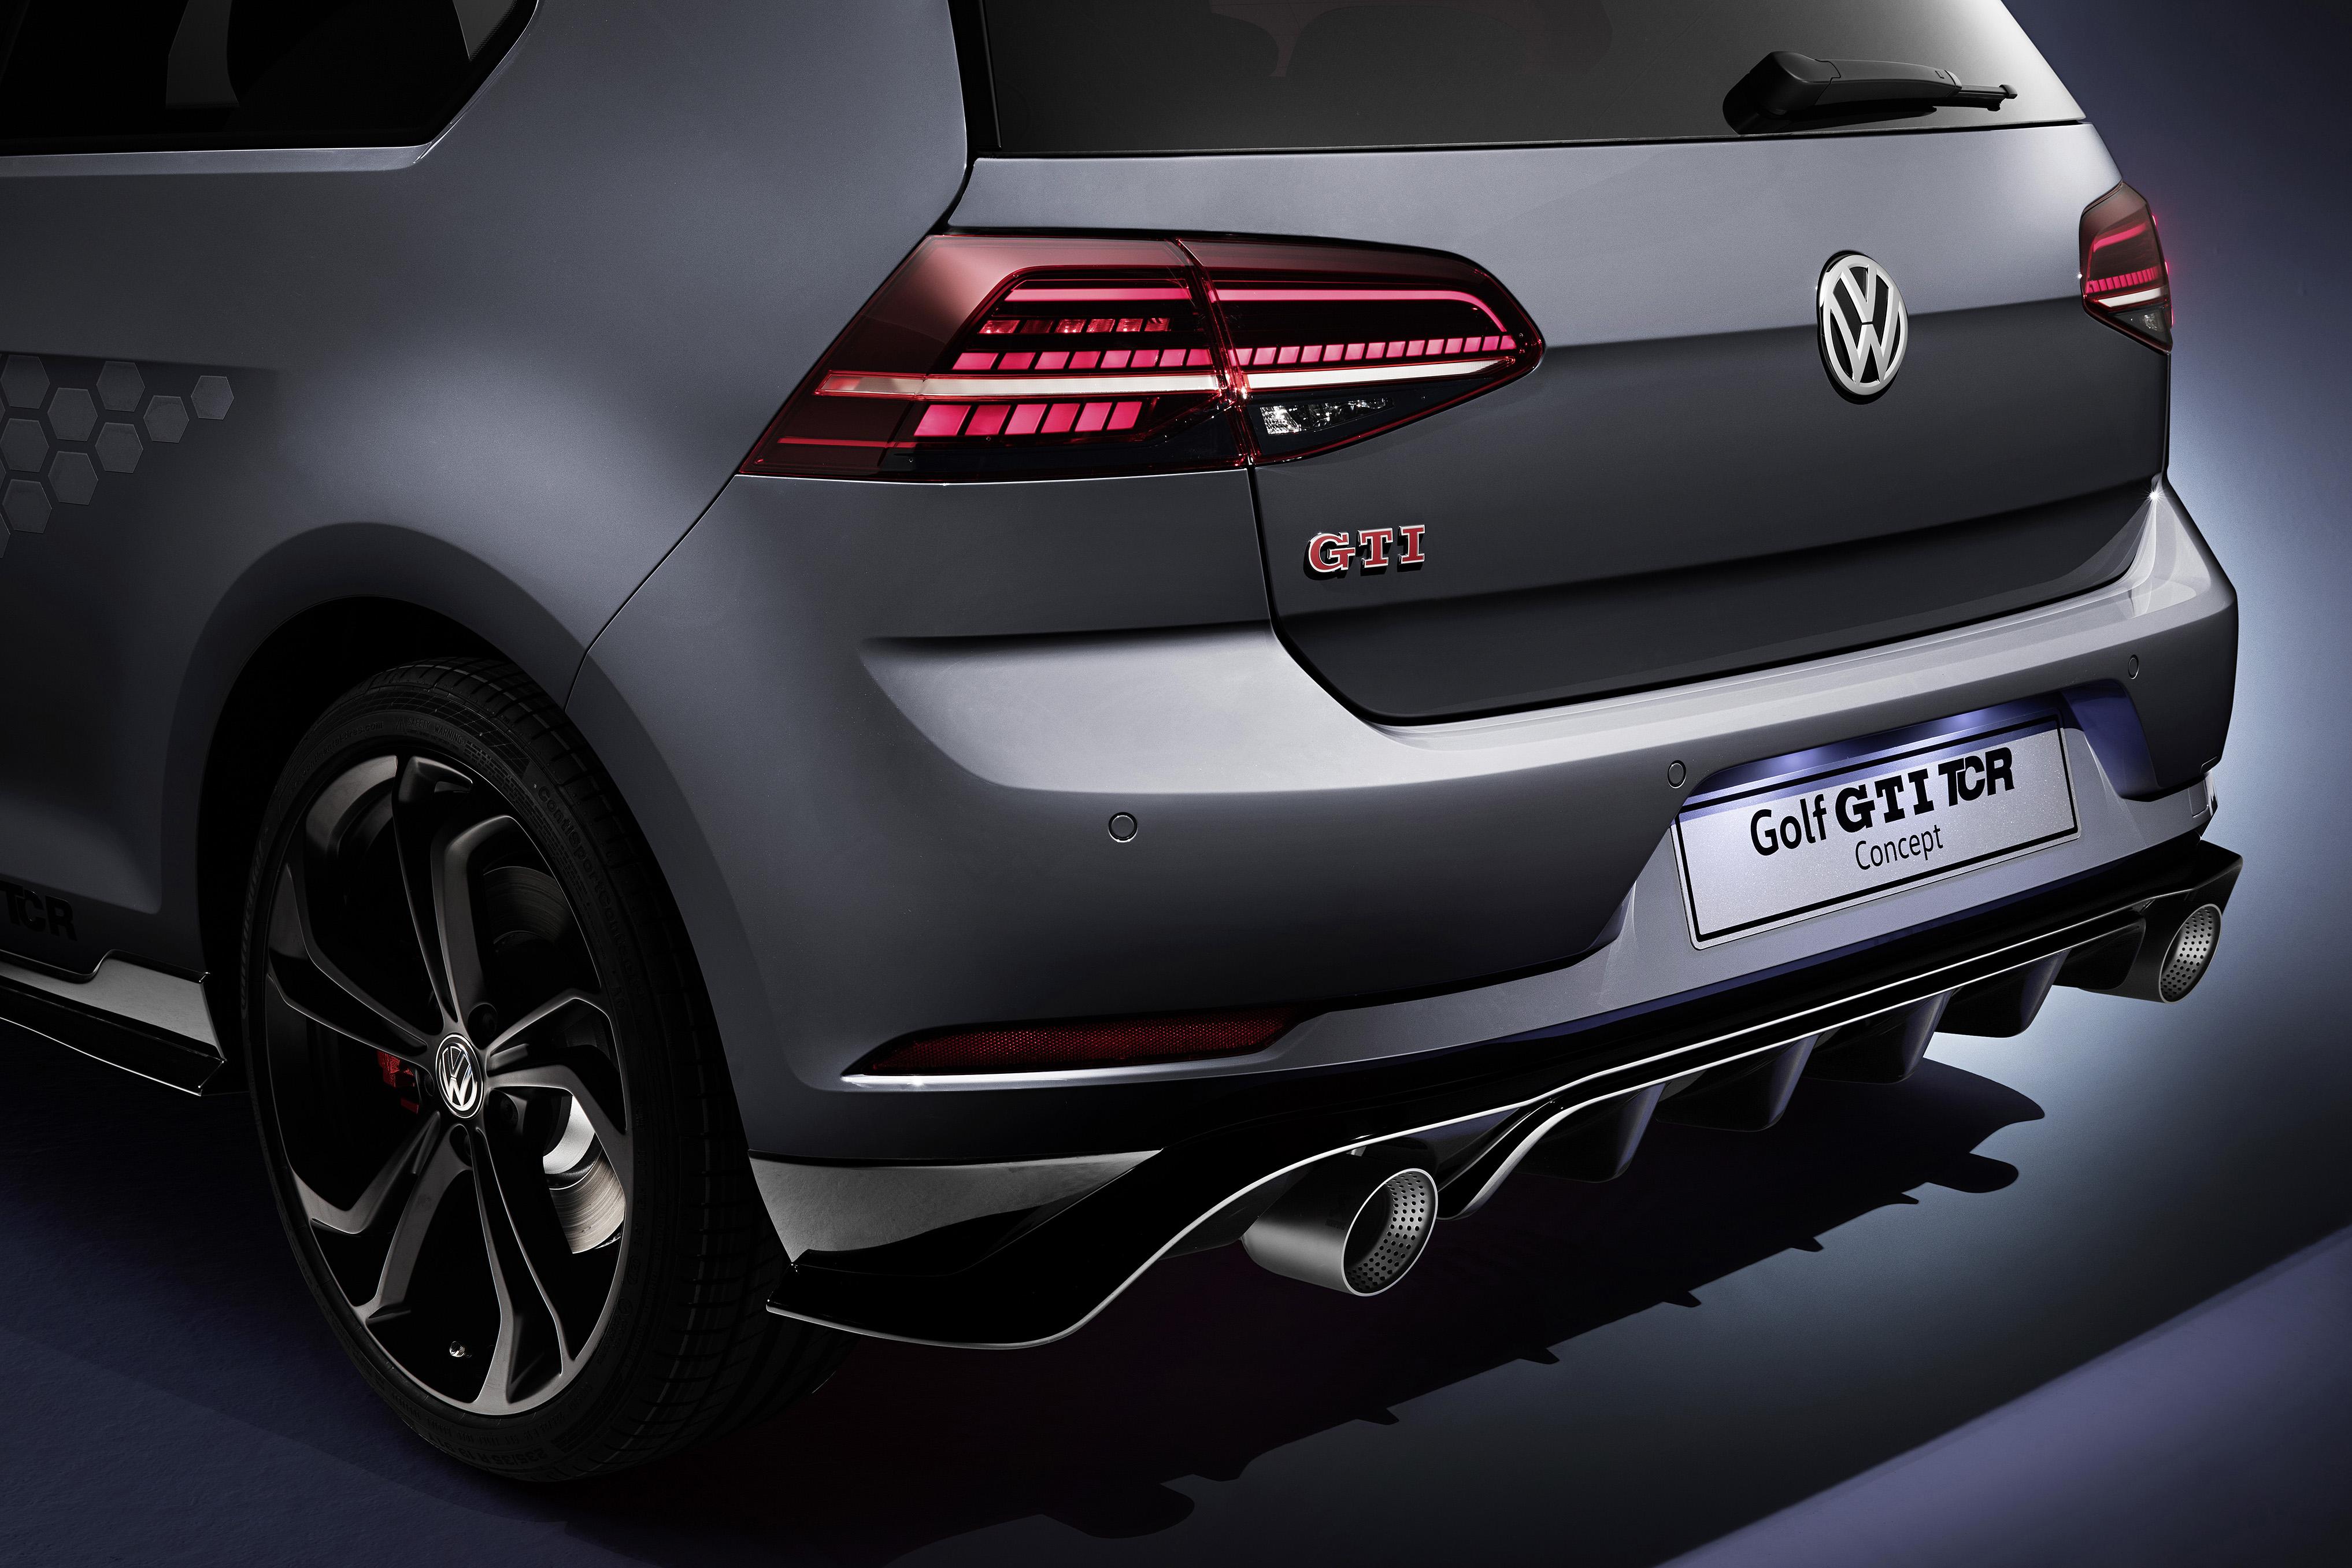 Golf GTI TCR Concept 6